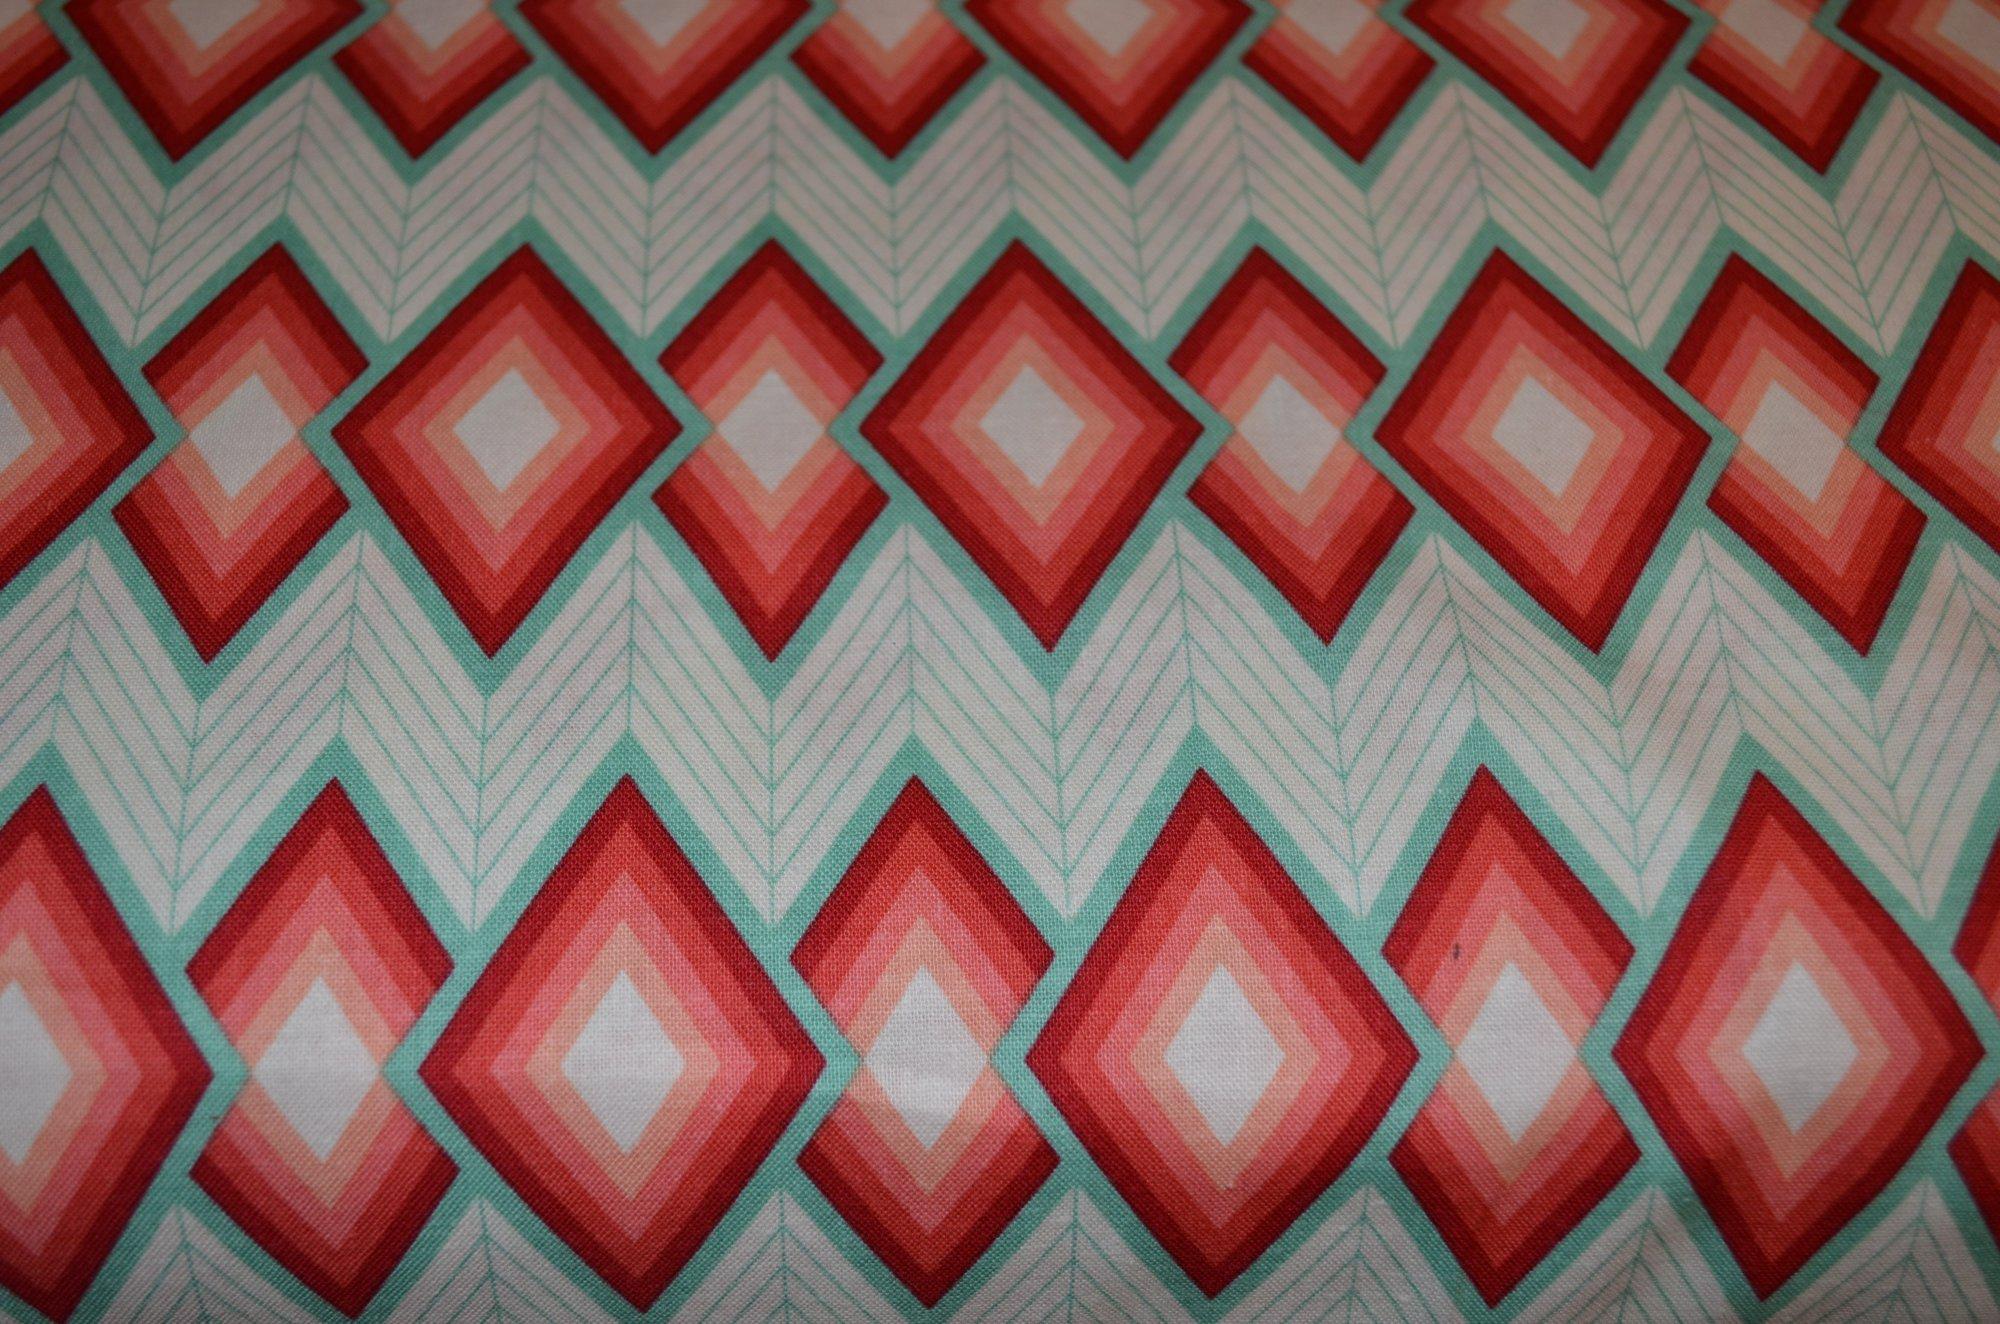 Free Spirit Florabelle  PWJD147SEDON Tapestry  Melon diamonds